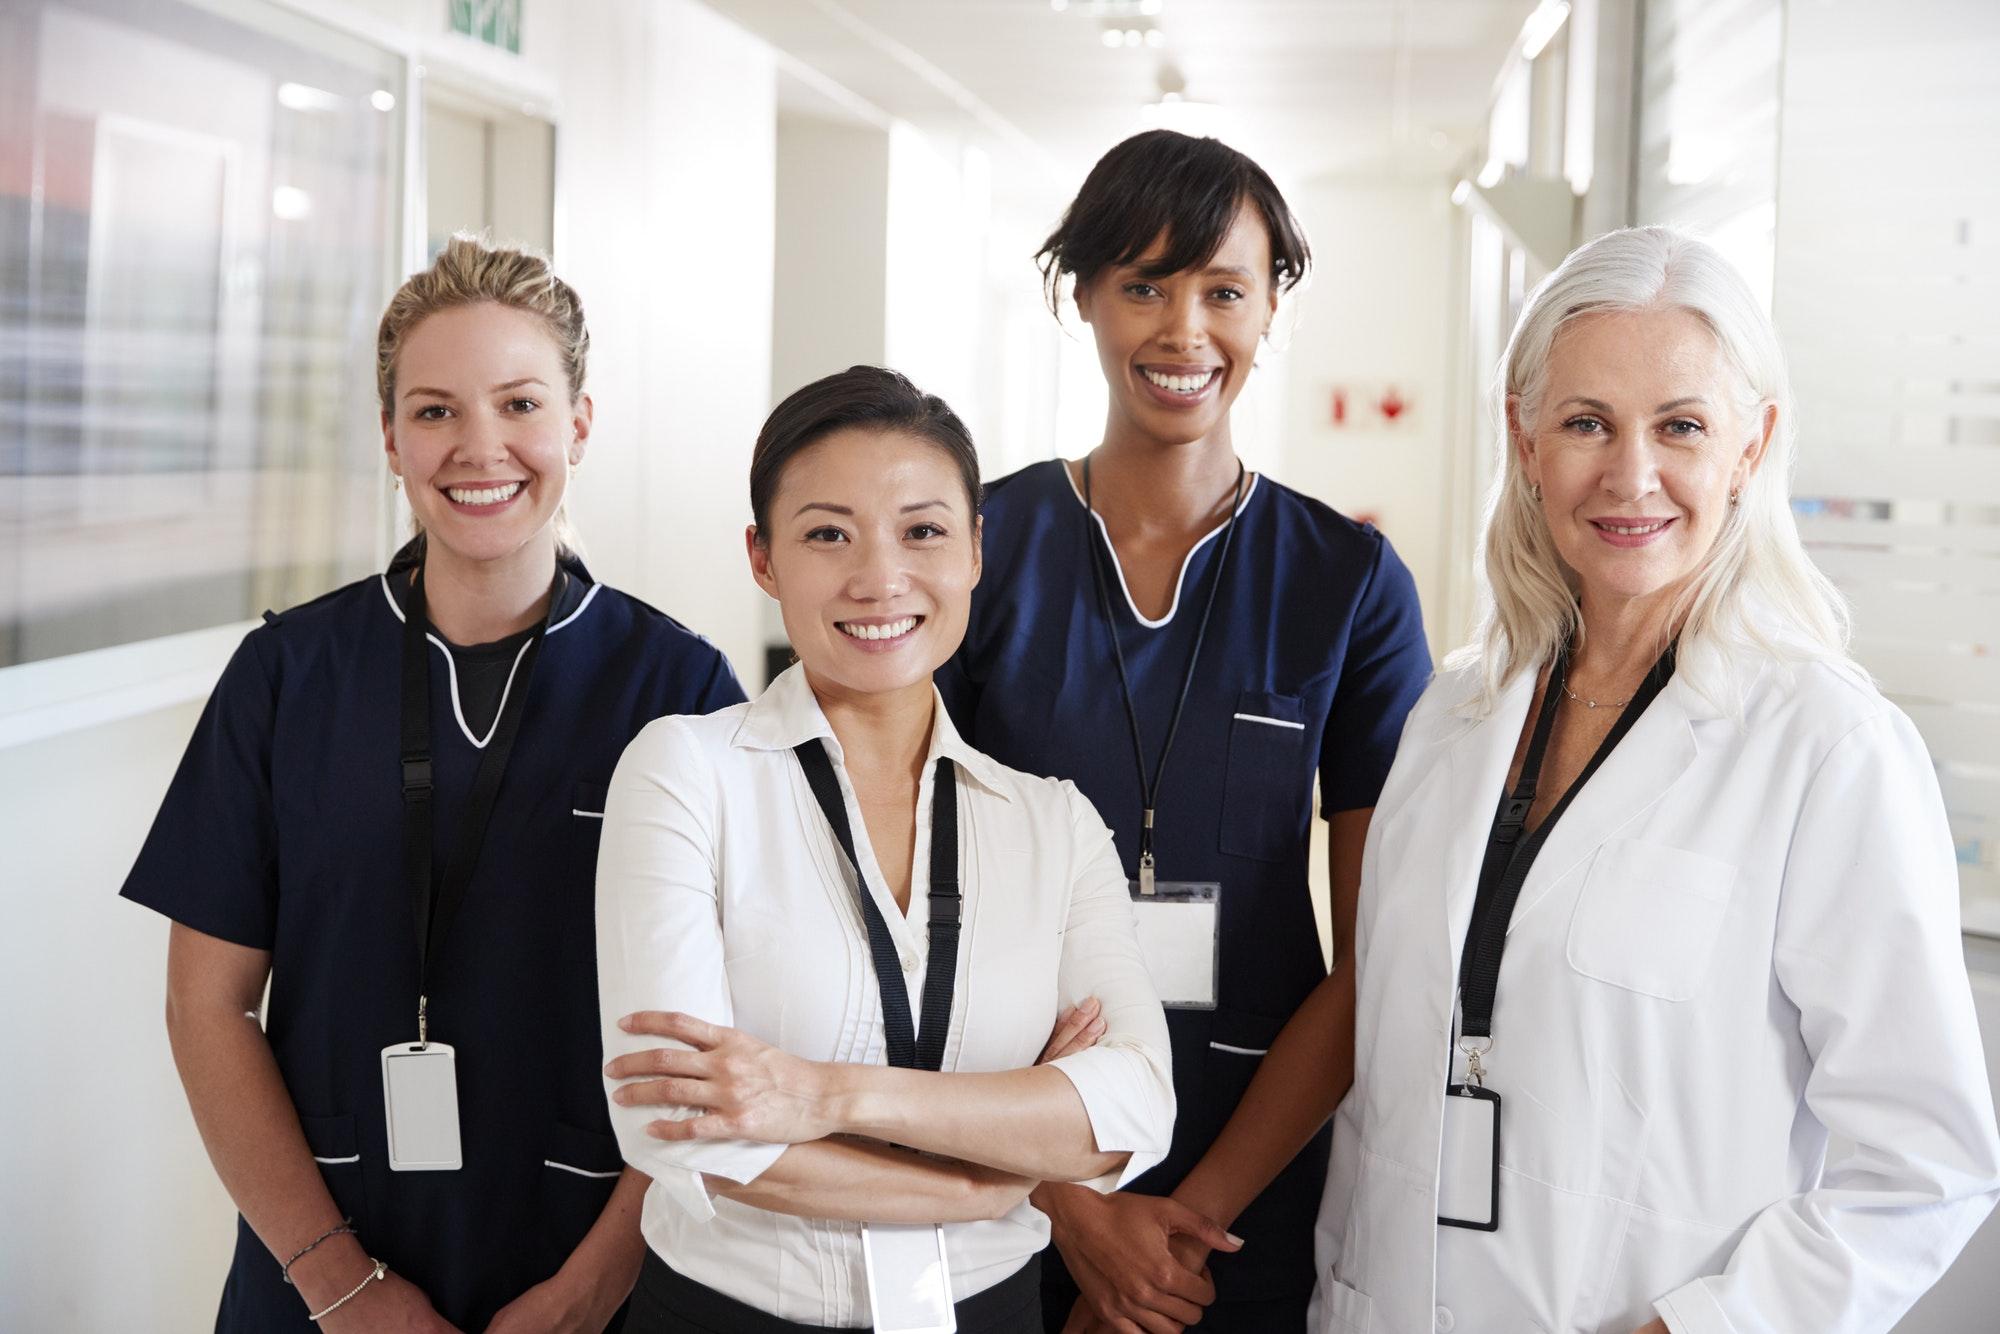 Portrait Of Female Medical Team Standing In Hospital Corridor